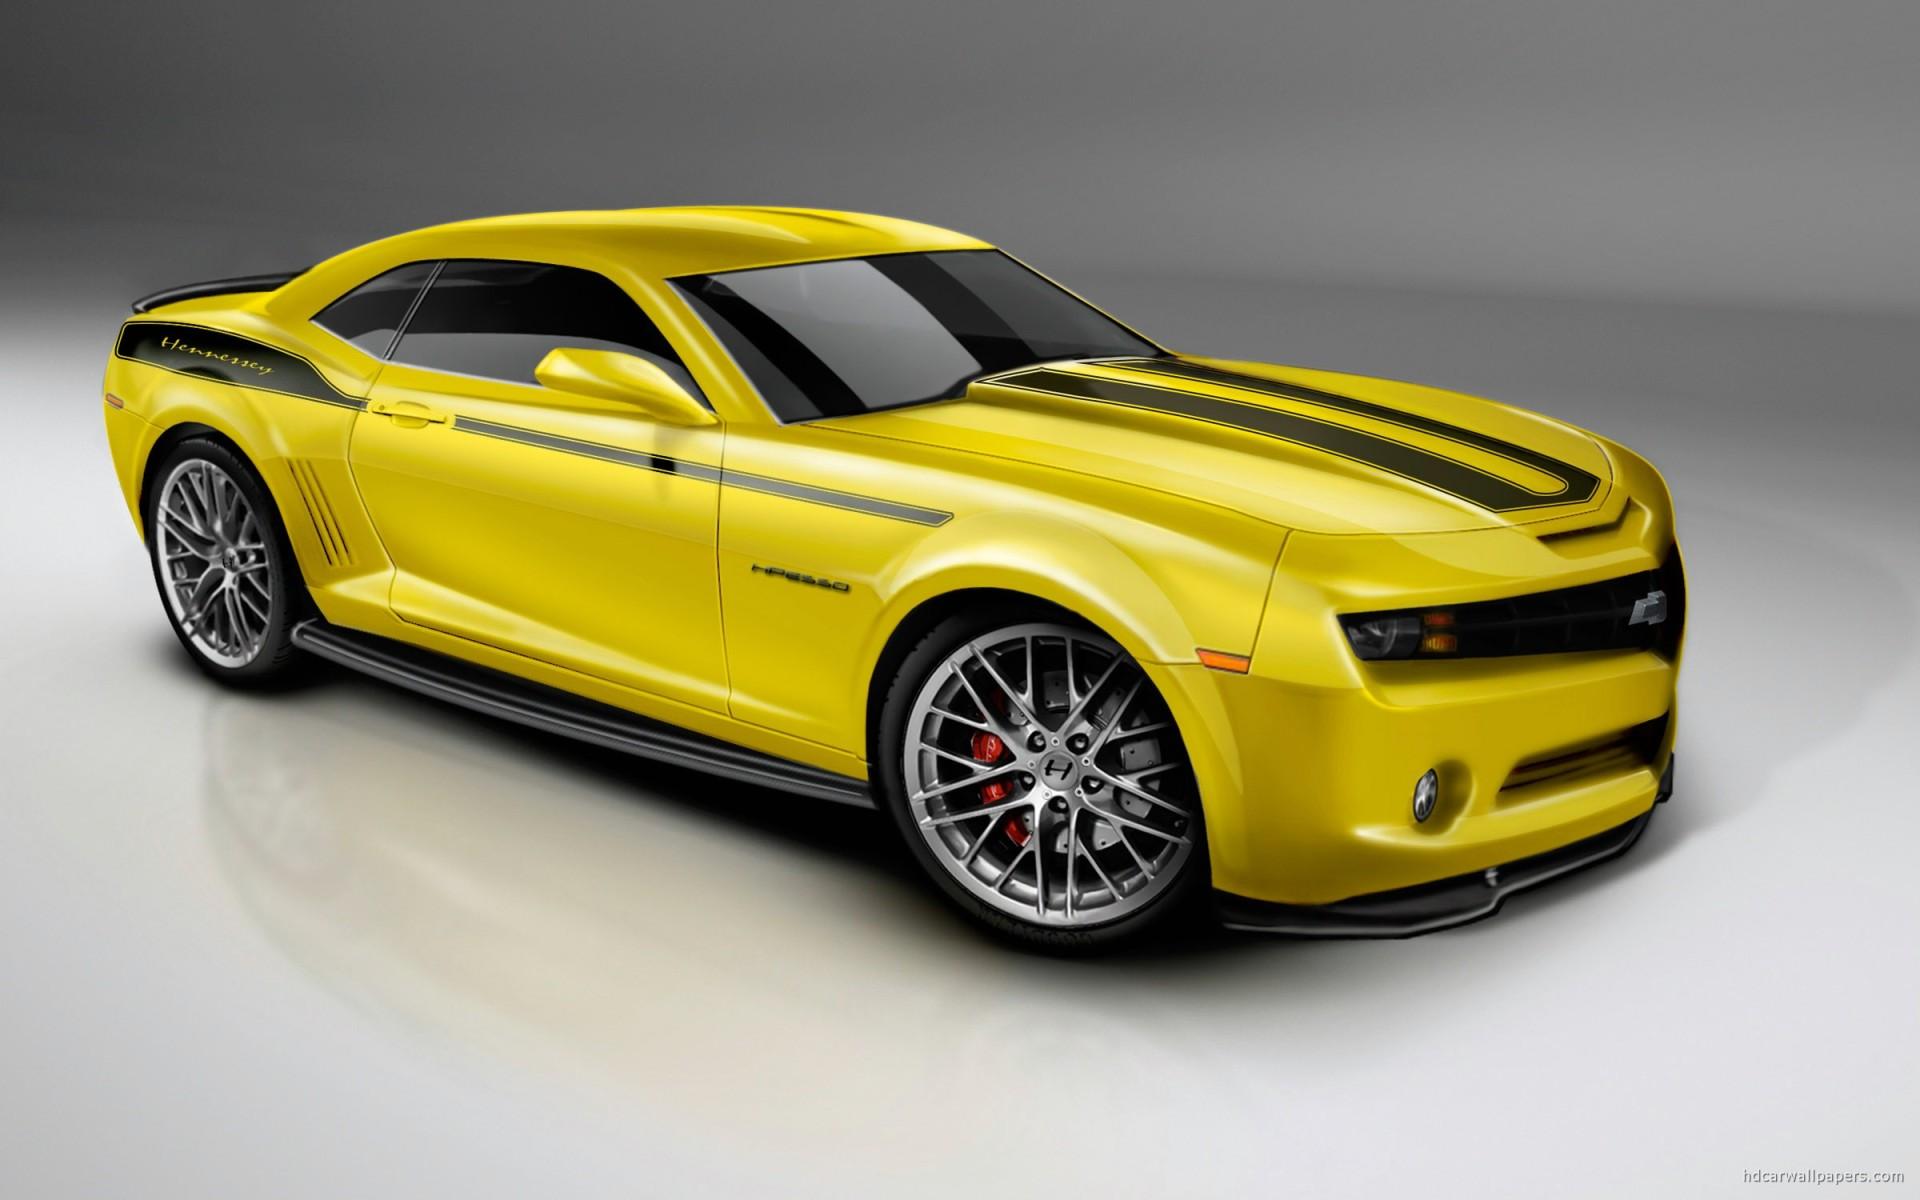 2010 Camero Yellow Wallpaper Hd Car Wallpapers Id 426